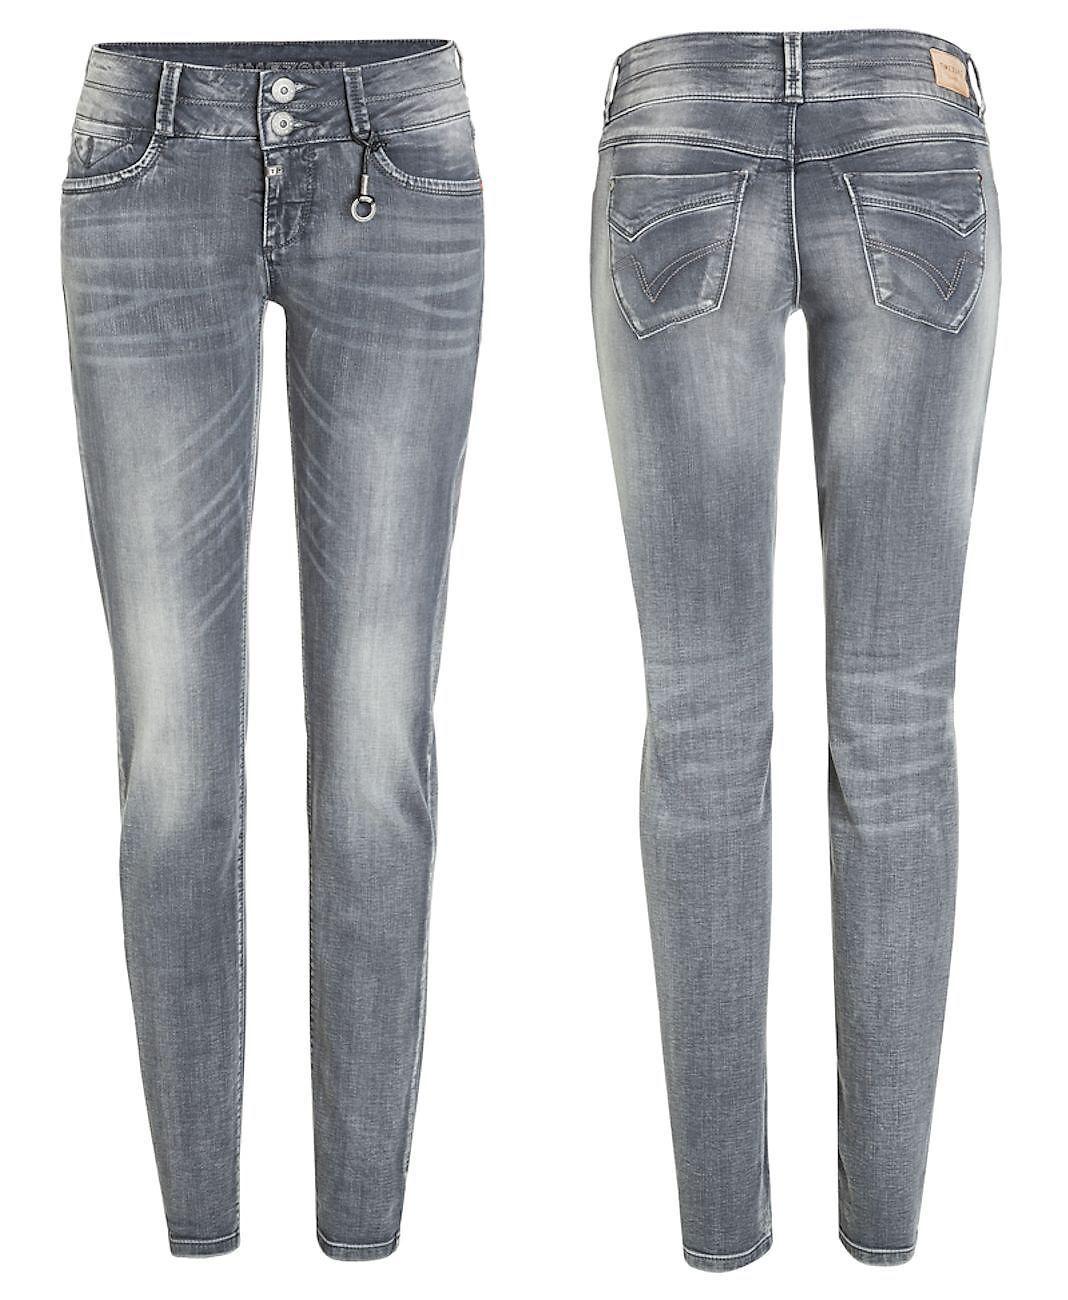 Timezone Damen Jeans Hose Stretch Slim Frauen Jeanshose Röhre Enya 17-10025